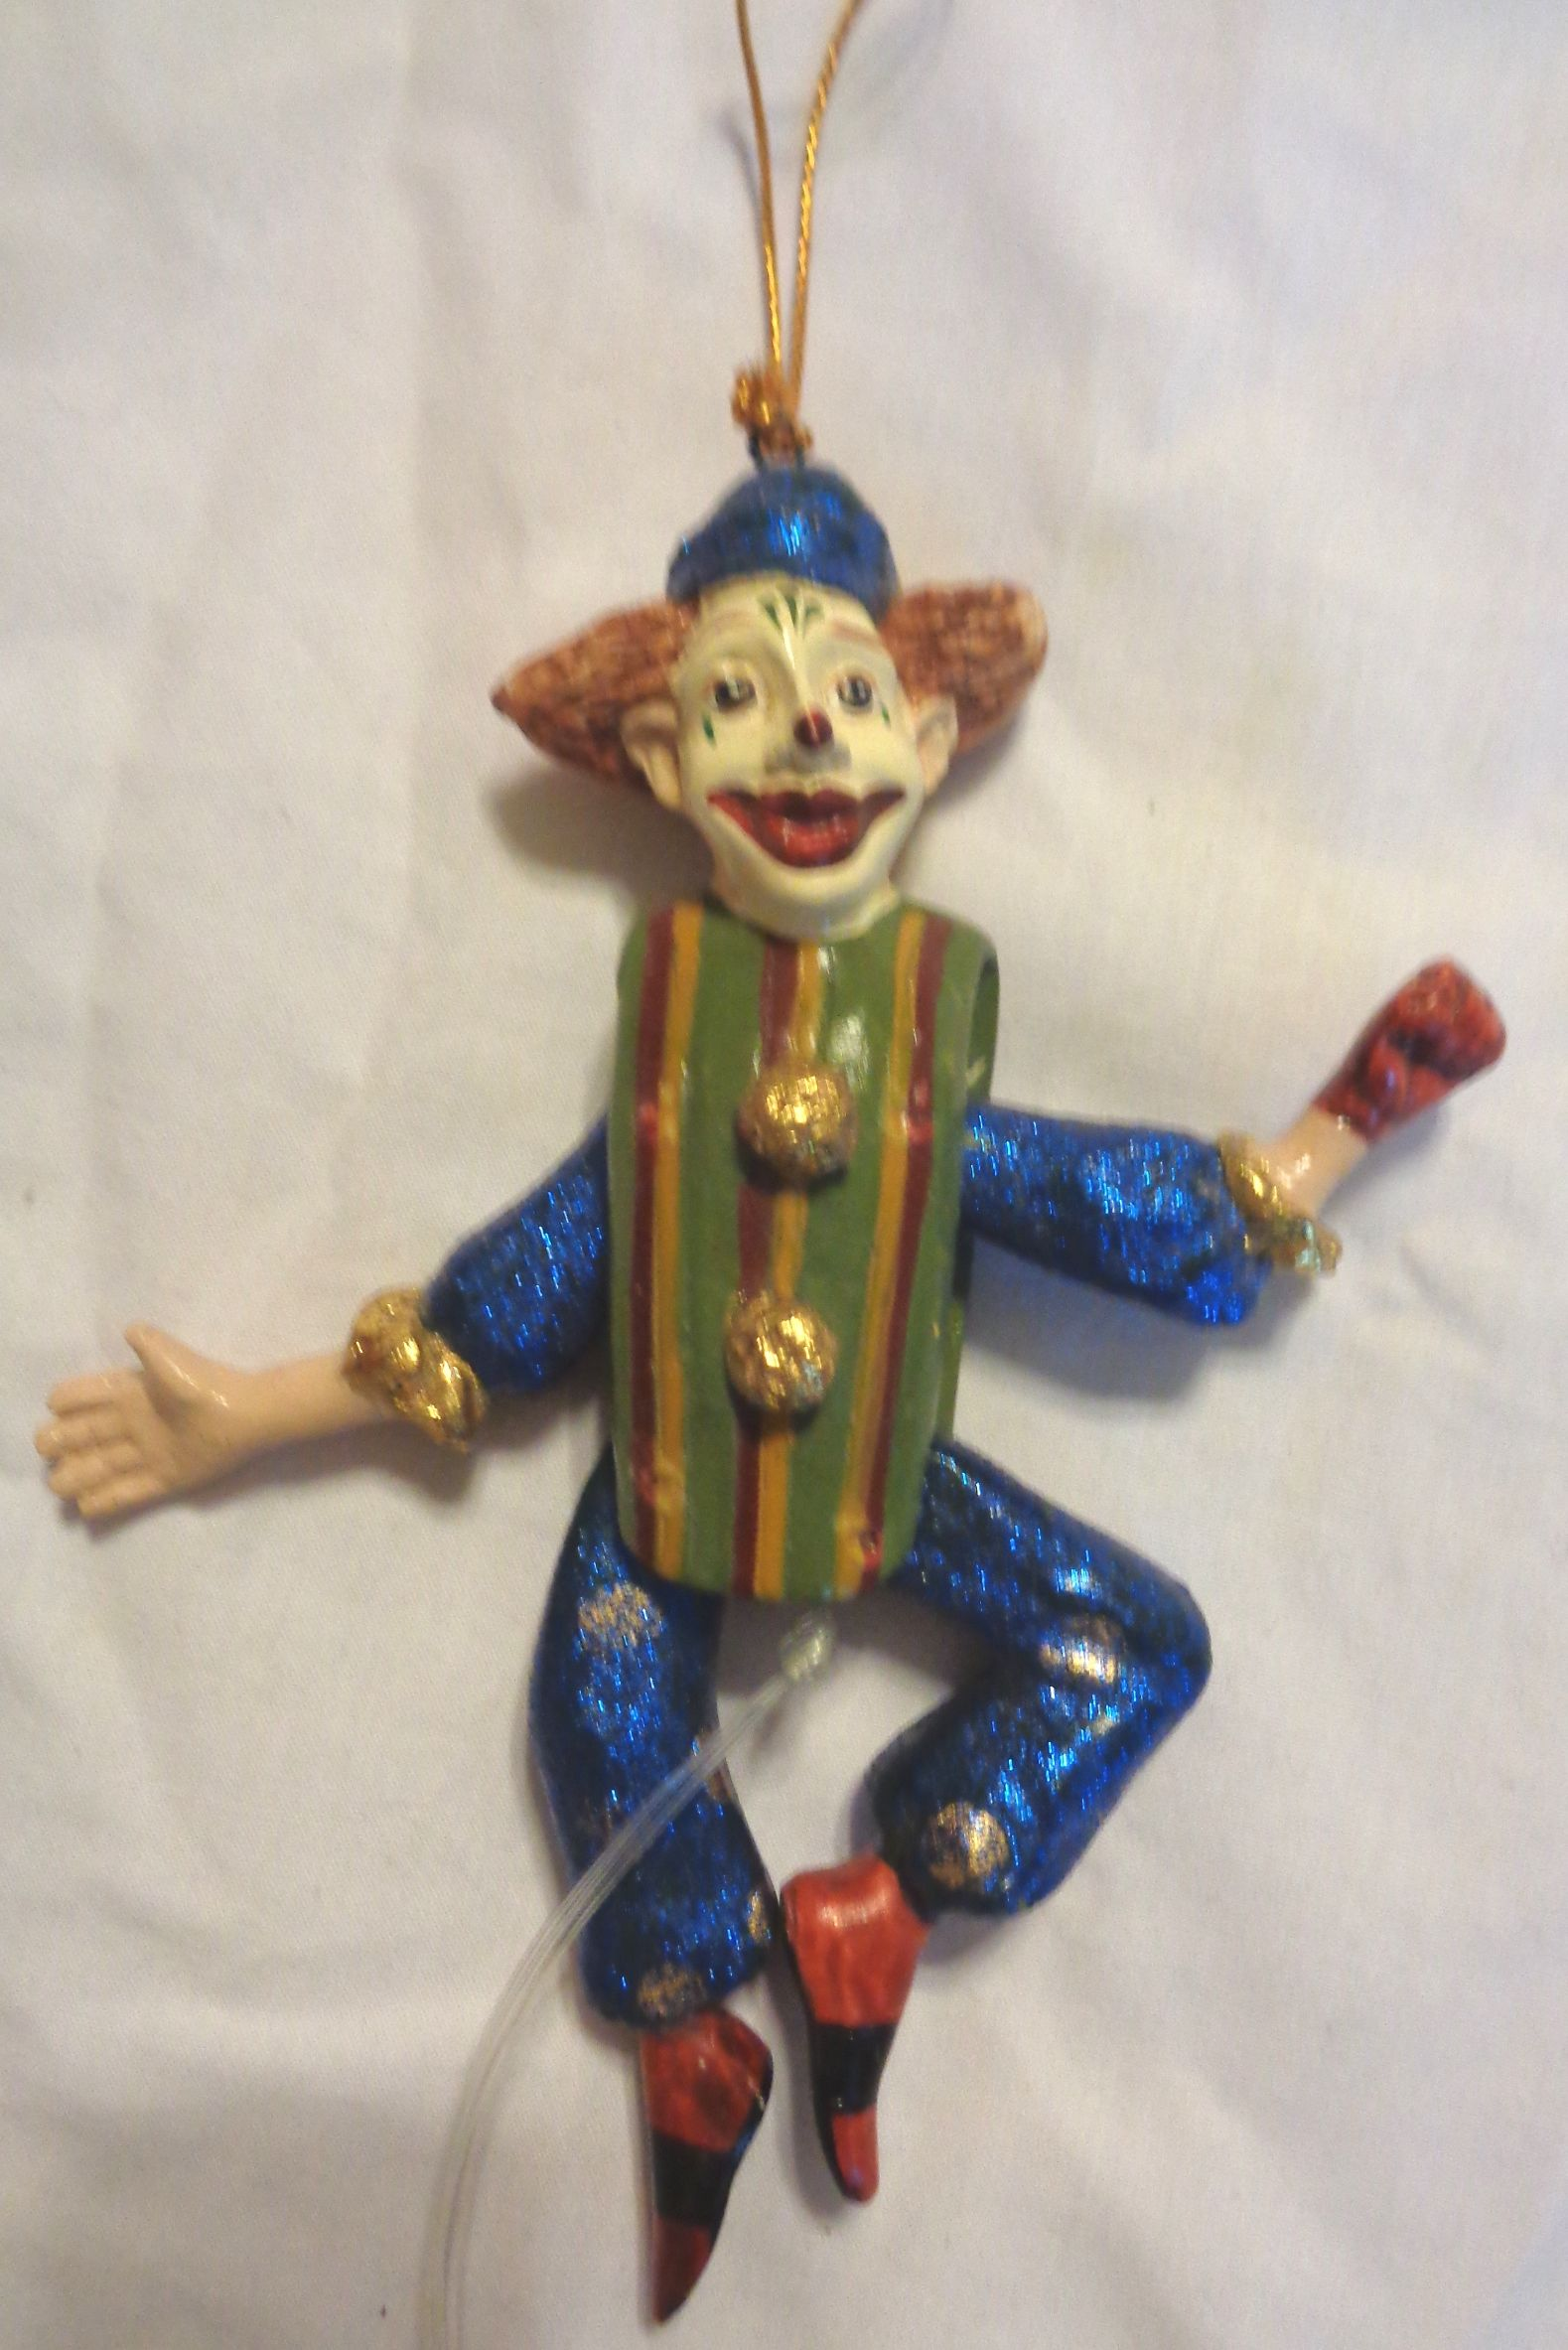 Joker Christmas Ornament.Vintage Germany Wood Christmas Ornament Vintage Clown Or